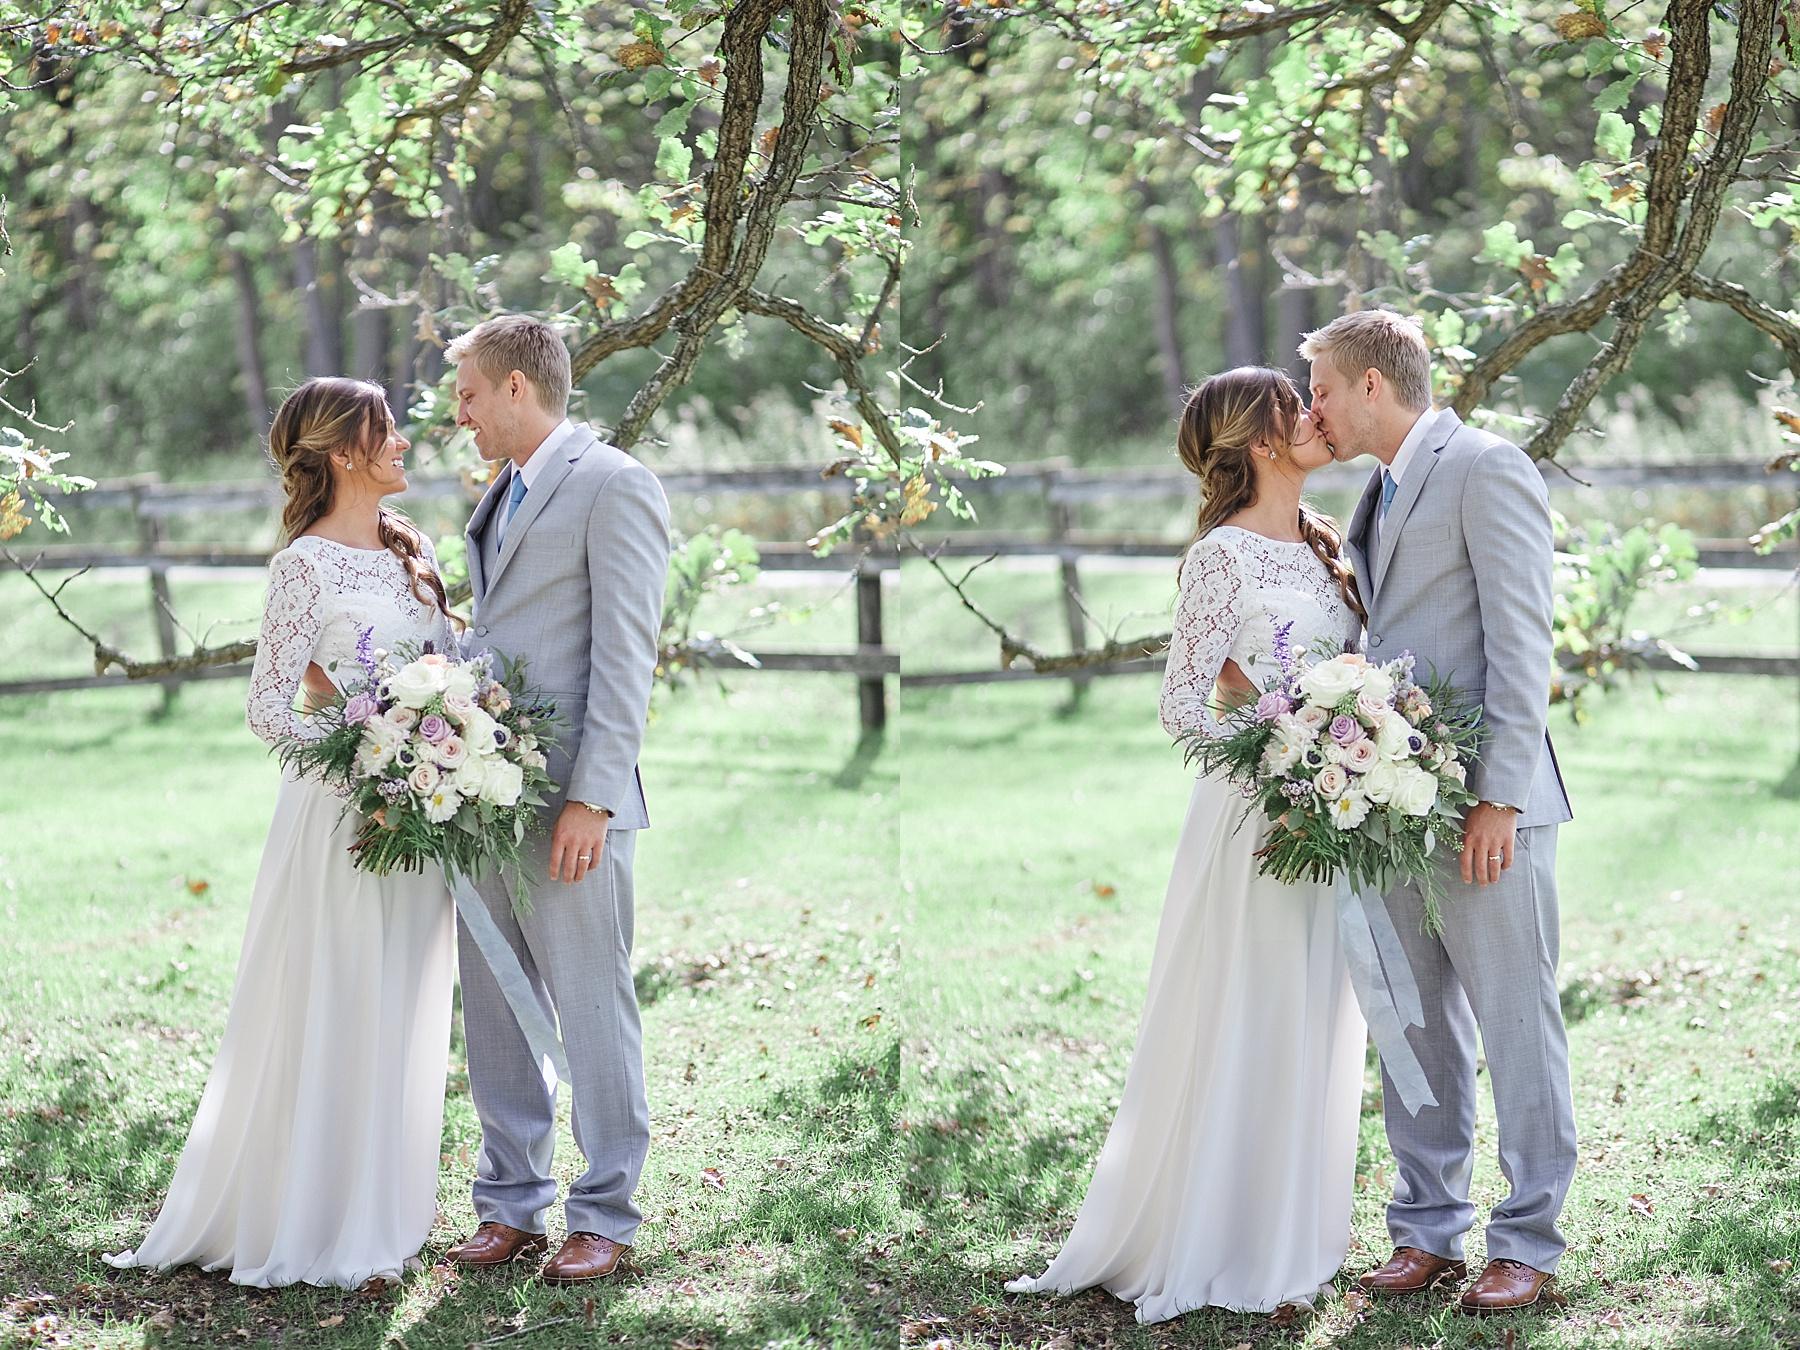 Maywood-Stone-Barn-Wedding-Rochester-Minnesota-Perry-James-Photo_0591.jpg